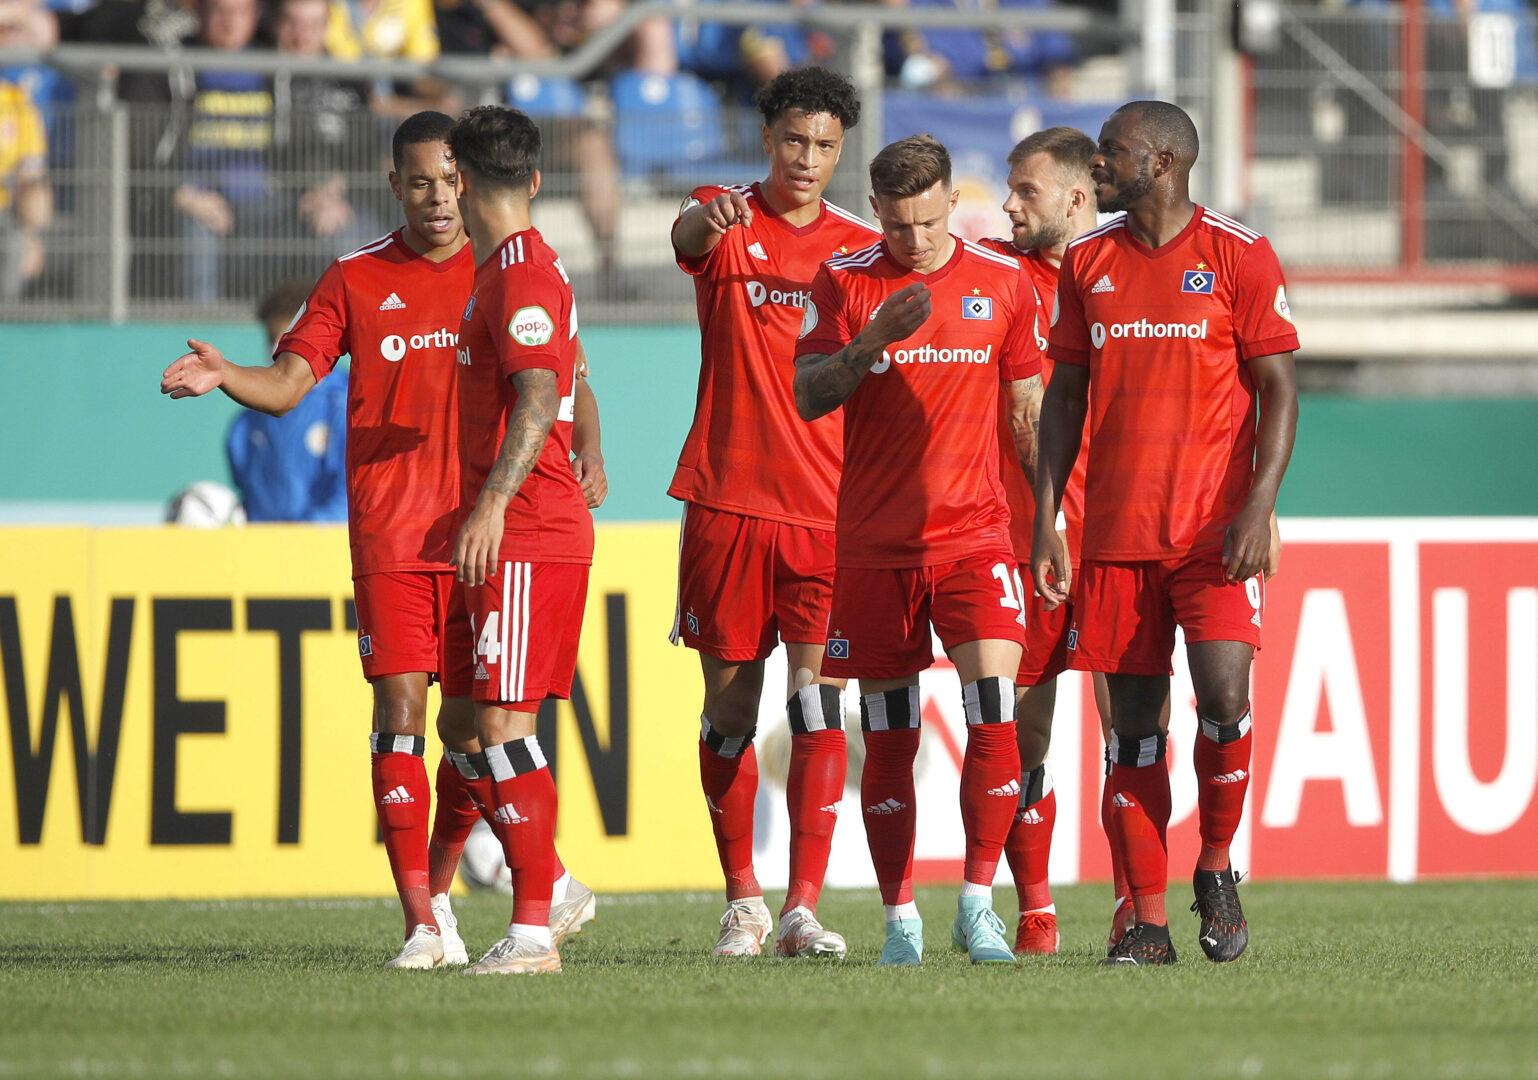 DFB-Pokal: HSV & Freiburg siegen knapp, Rostock-Sieg in der 120.!